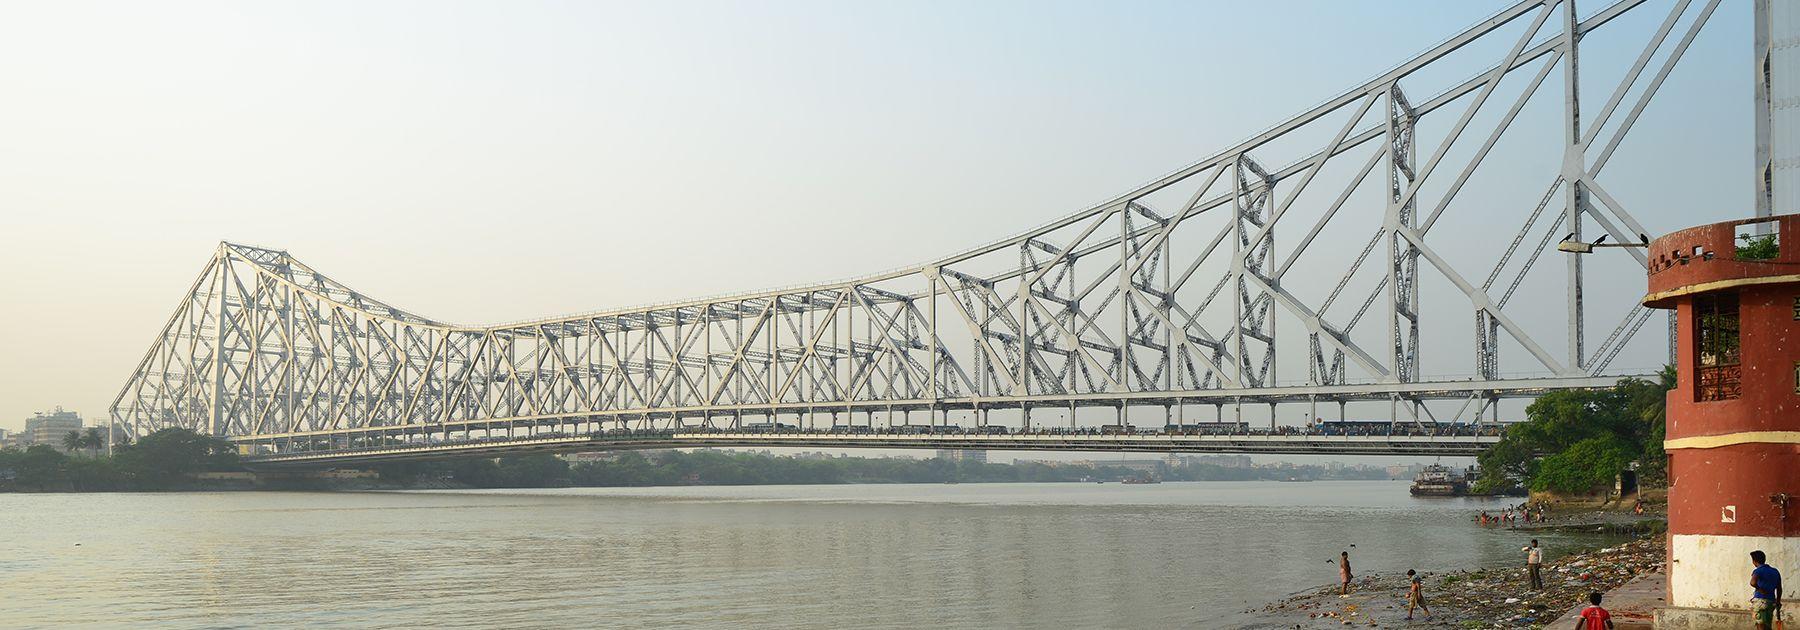 The Howrah Bridge straddles West Bengal's Hooghly River in Kolkata. (Christopher J. Fynn, licensed under CC BY-SA 4.0)